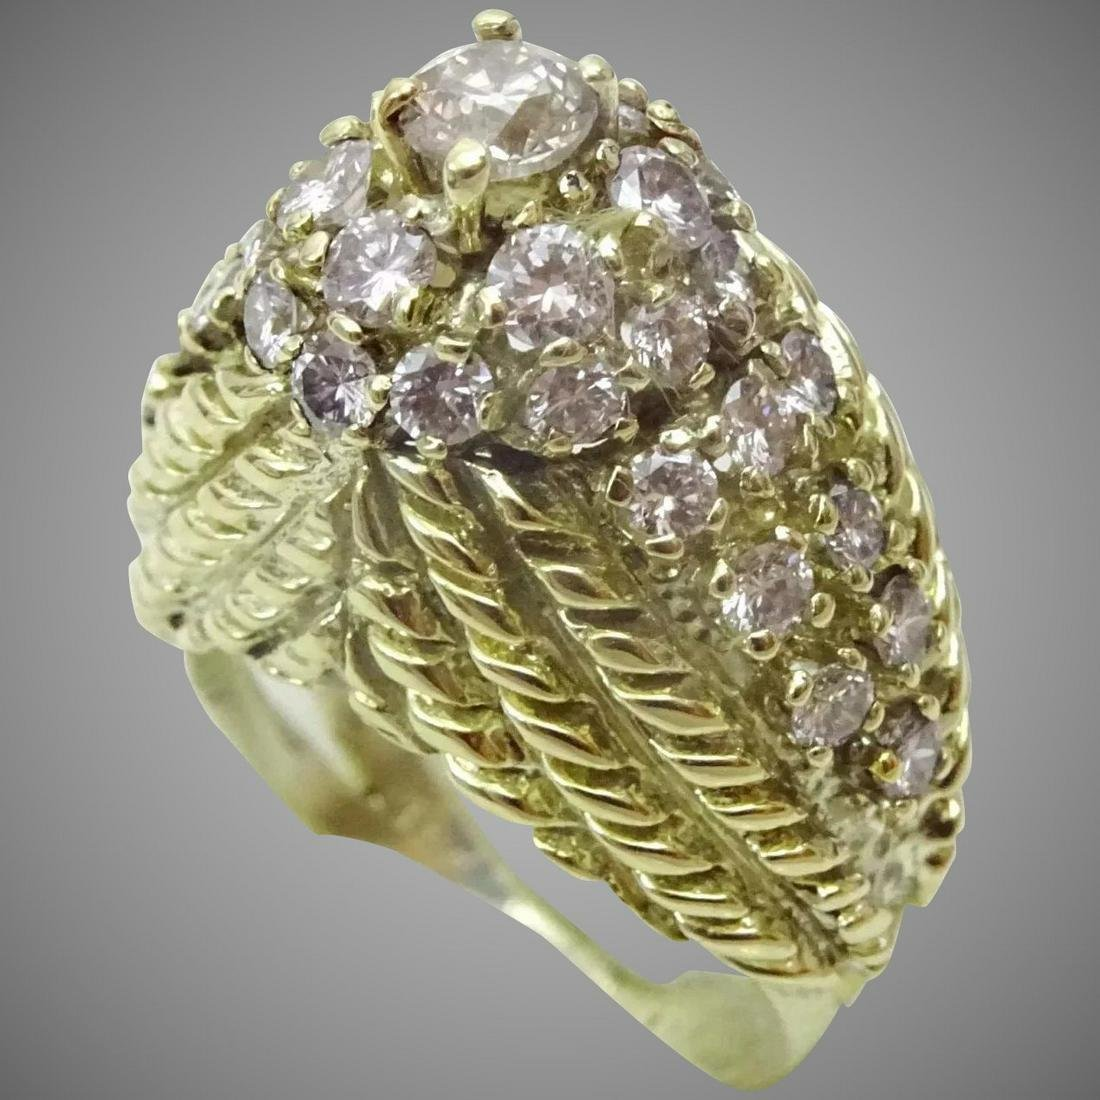 Unique 14 karat Gold and Diamond Sculpted Ring